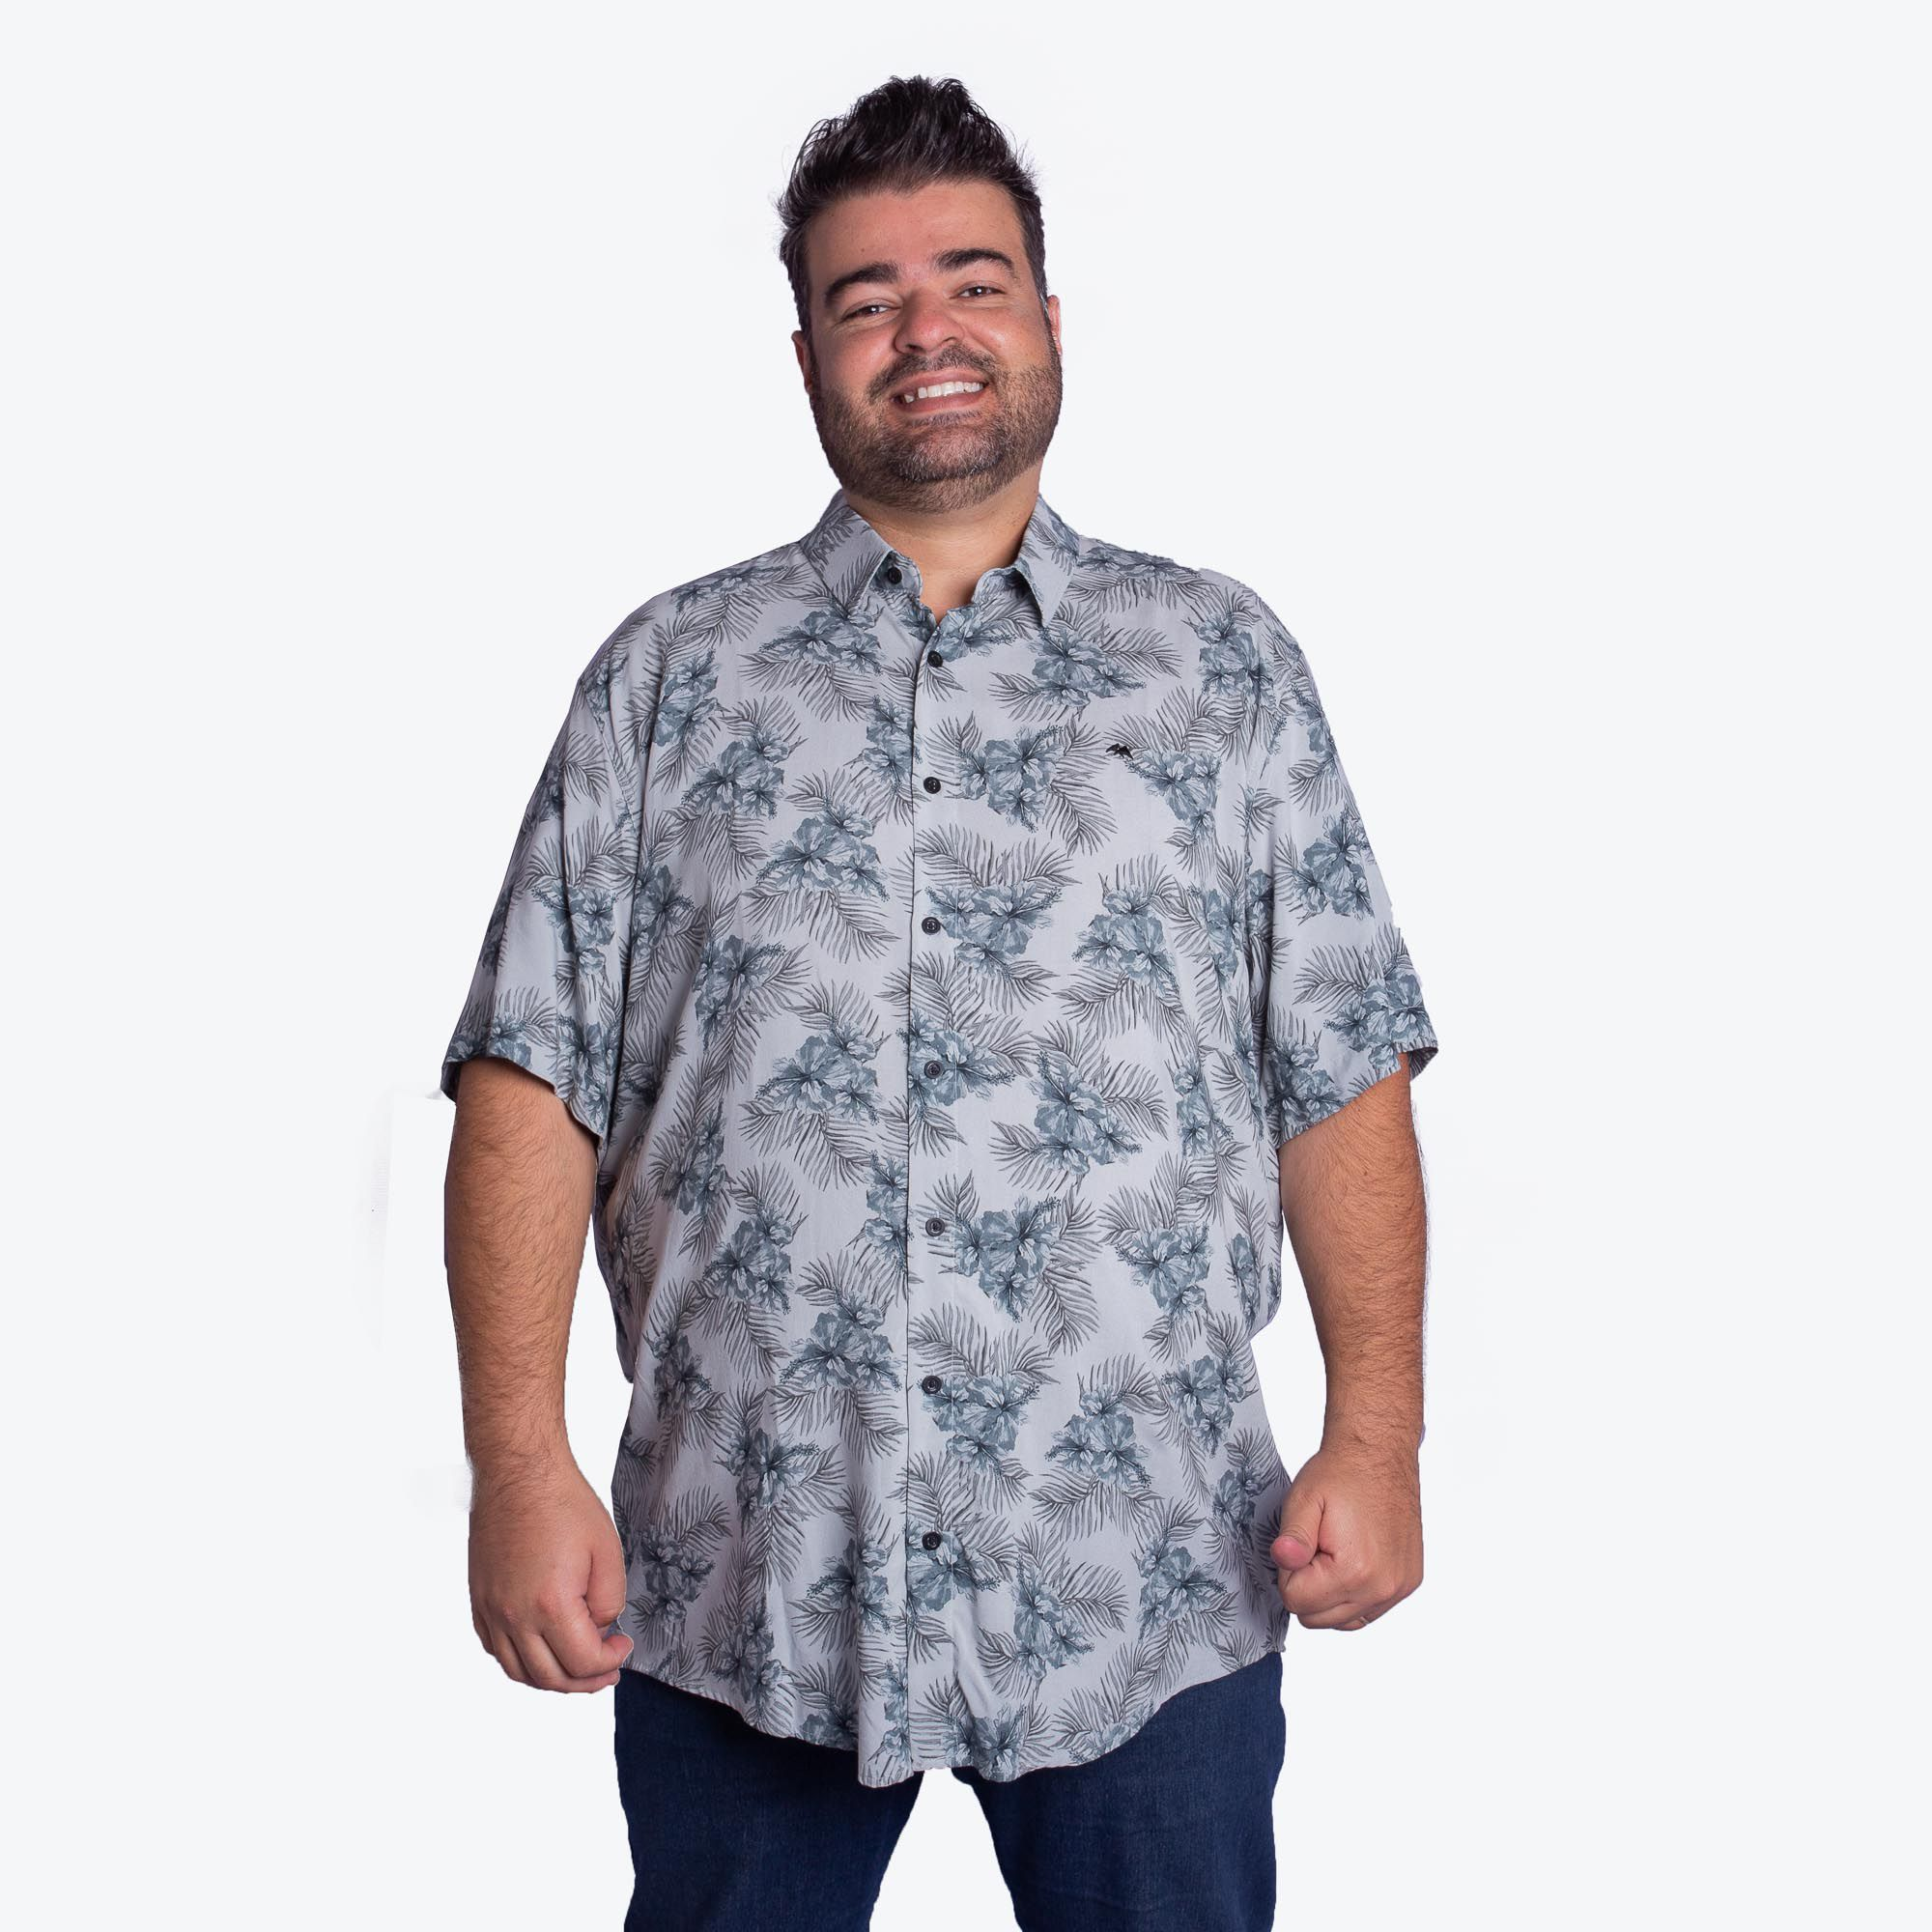 Camisa Masculina Plus Size Viscose Floral - MX-72